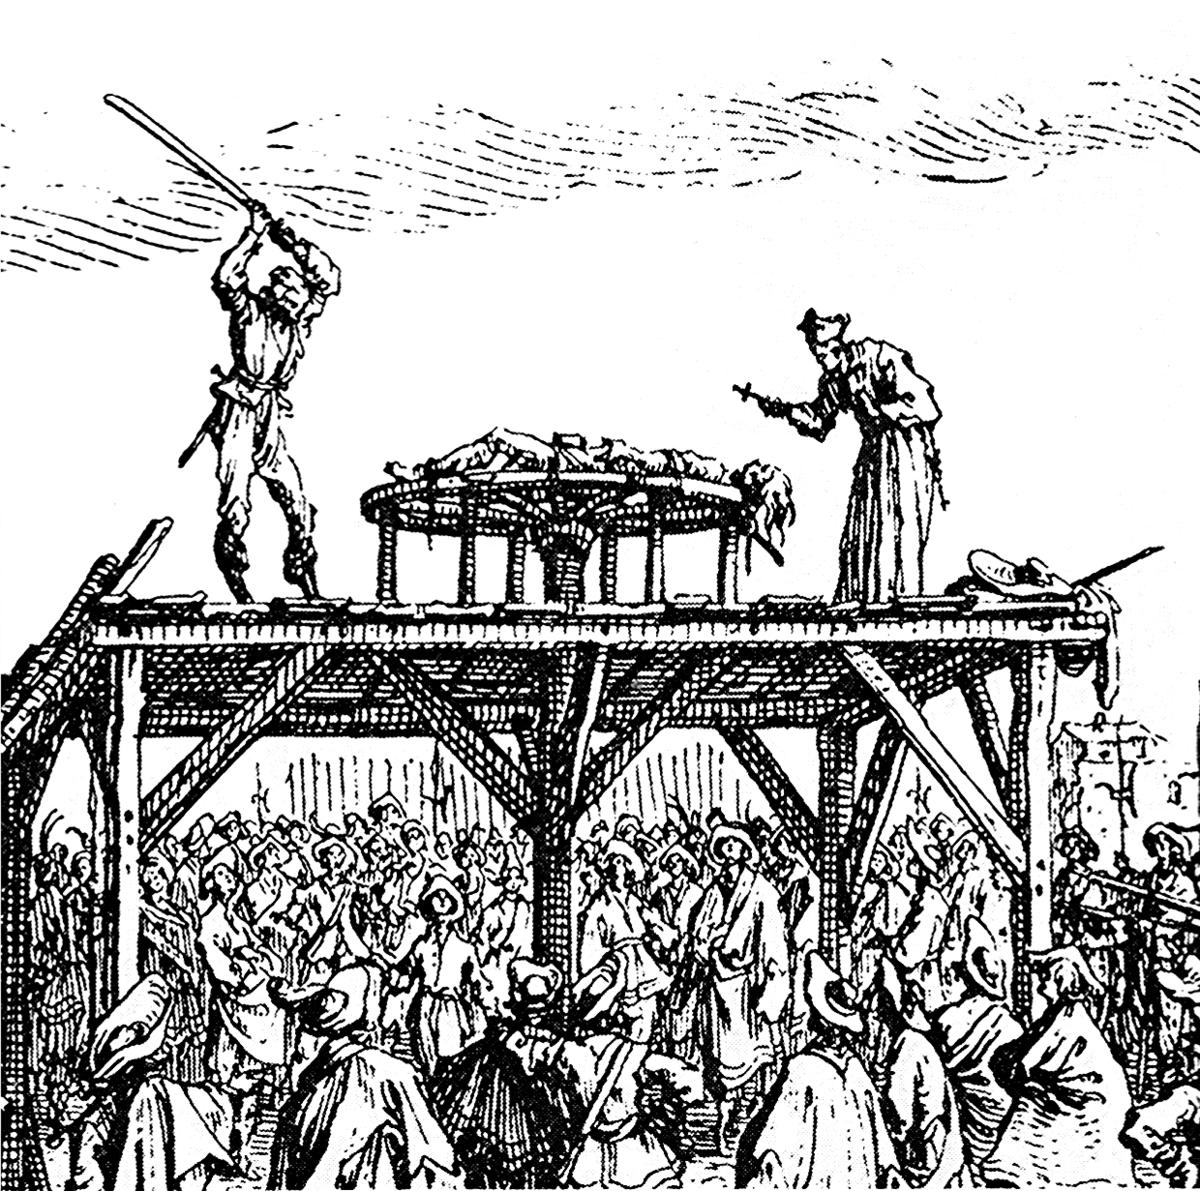 La rueda - Wikipedia, la enciclopedia libre